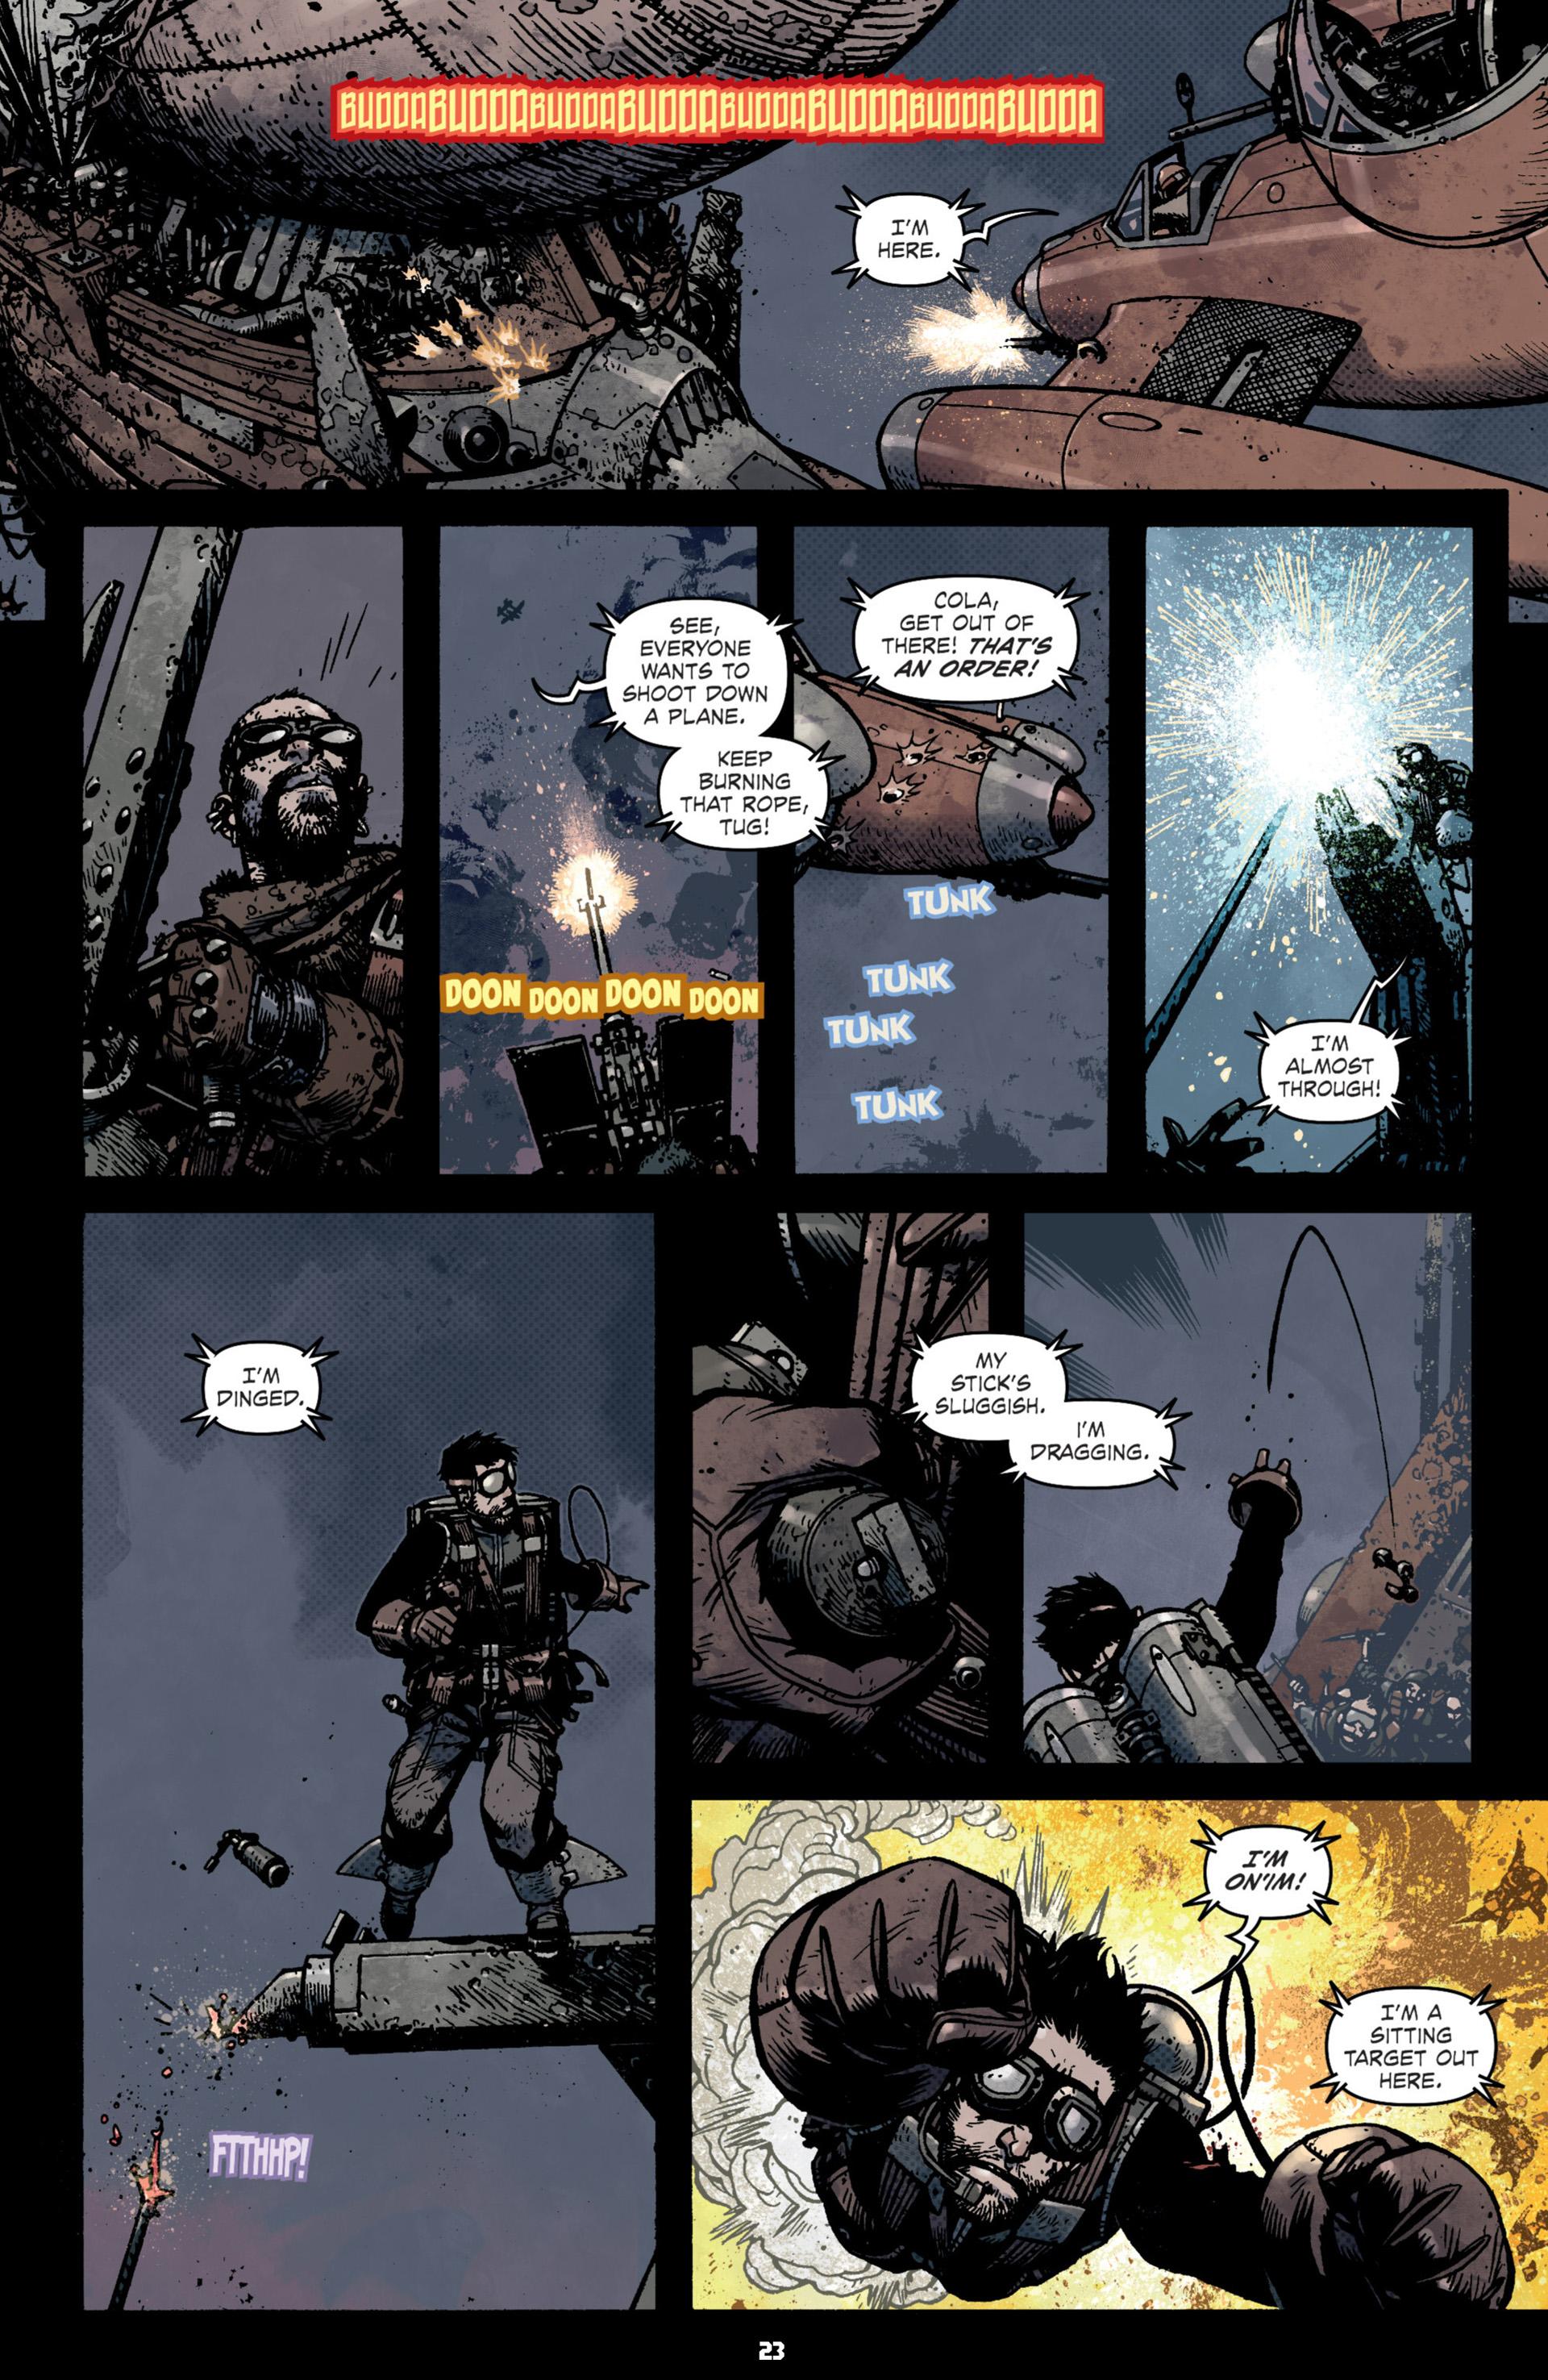 Wild Blue Yonder 3 Page 23